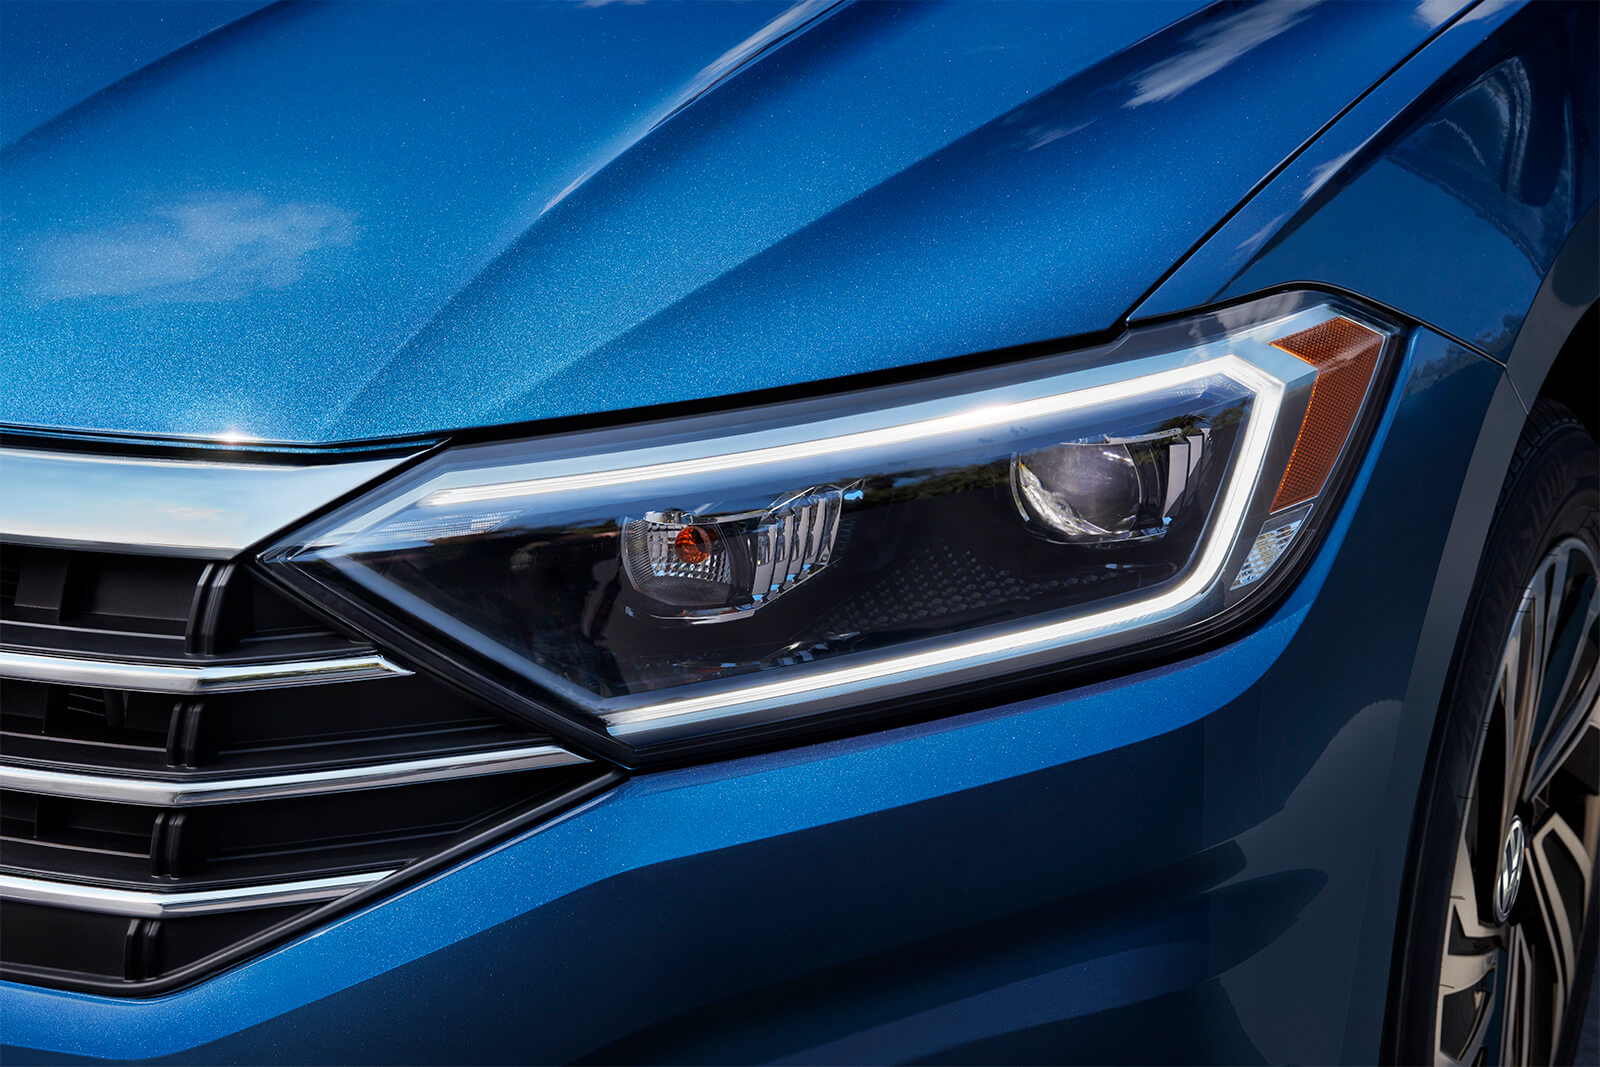 2019 Volkswagen Jetta Exterior at Mississauga Volkswagen in Mississauga and Toronto